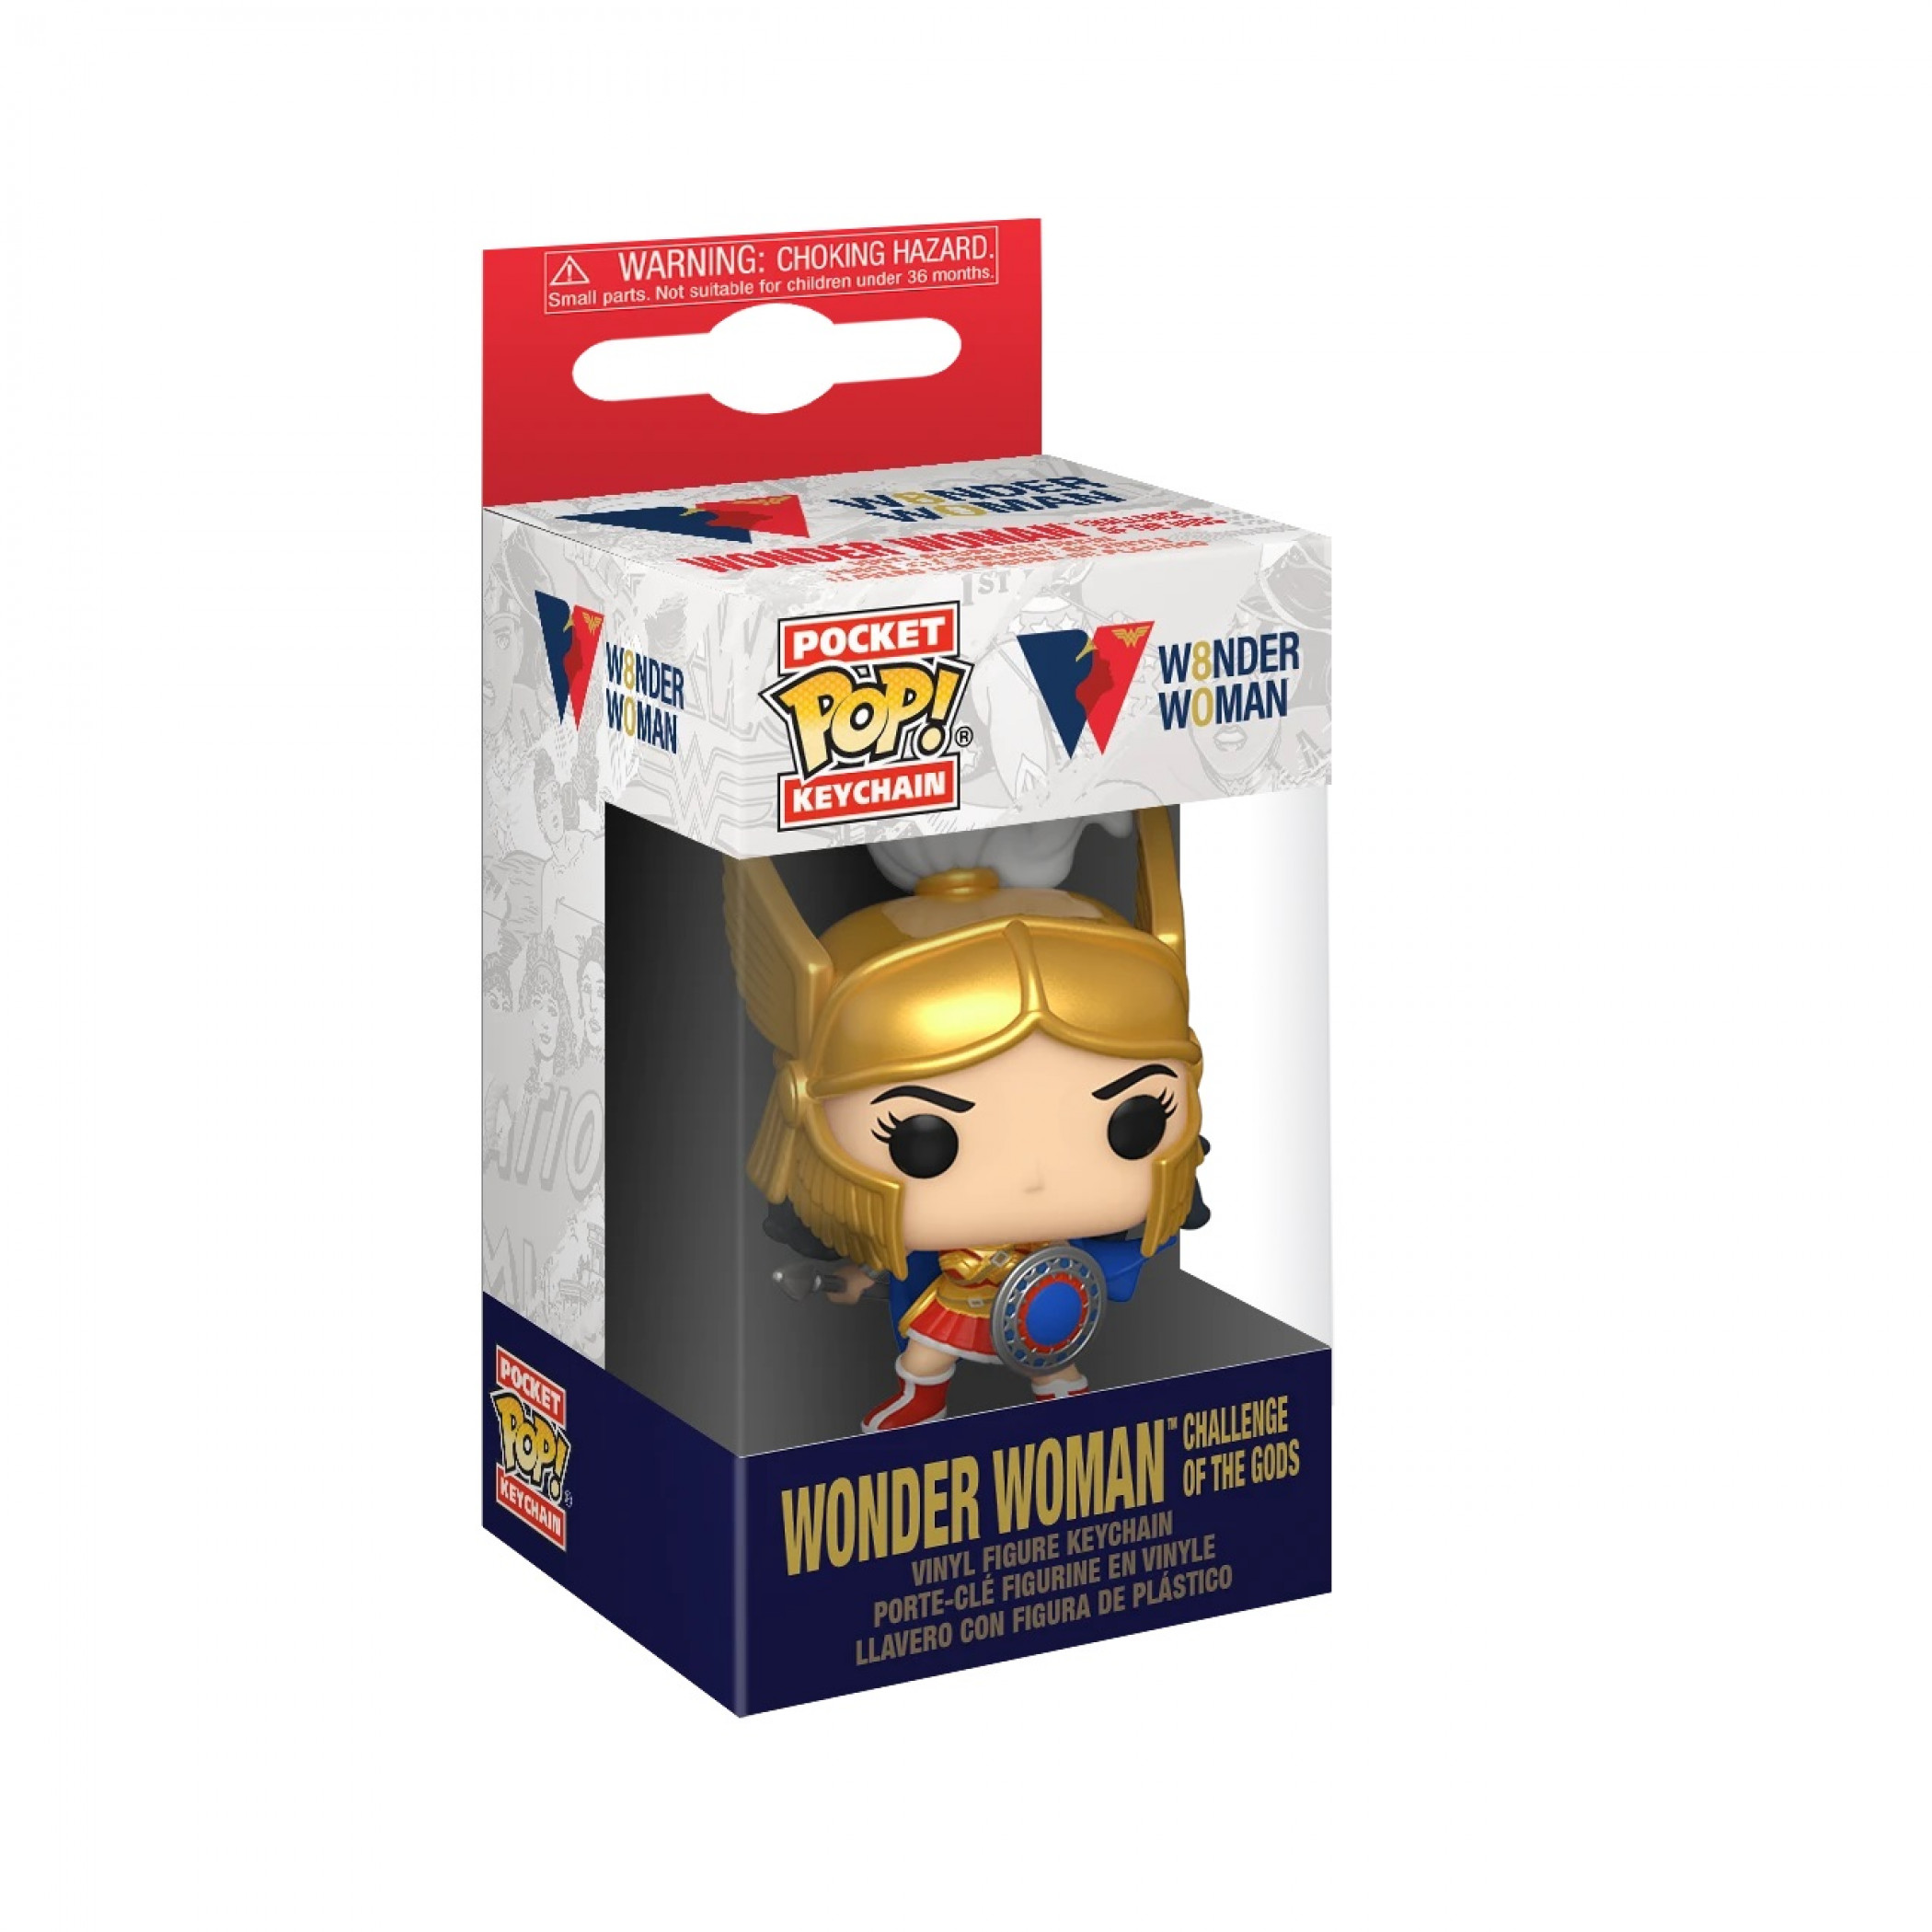 Wonder Woman 80th Anniversary Funko Pop! Keychain